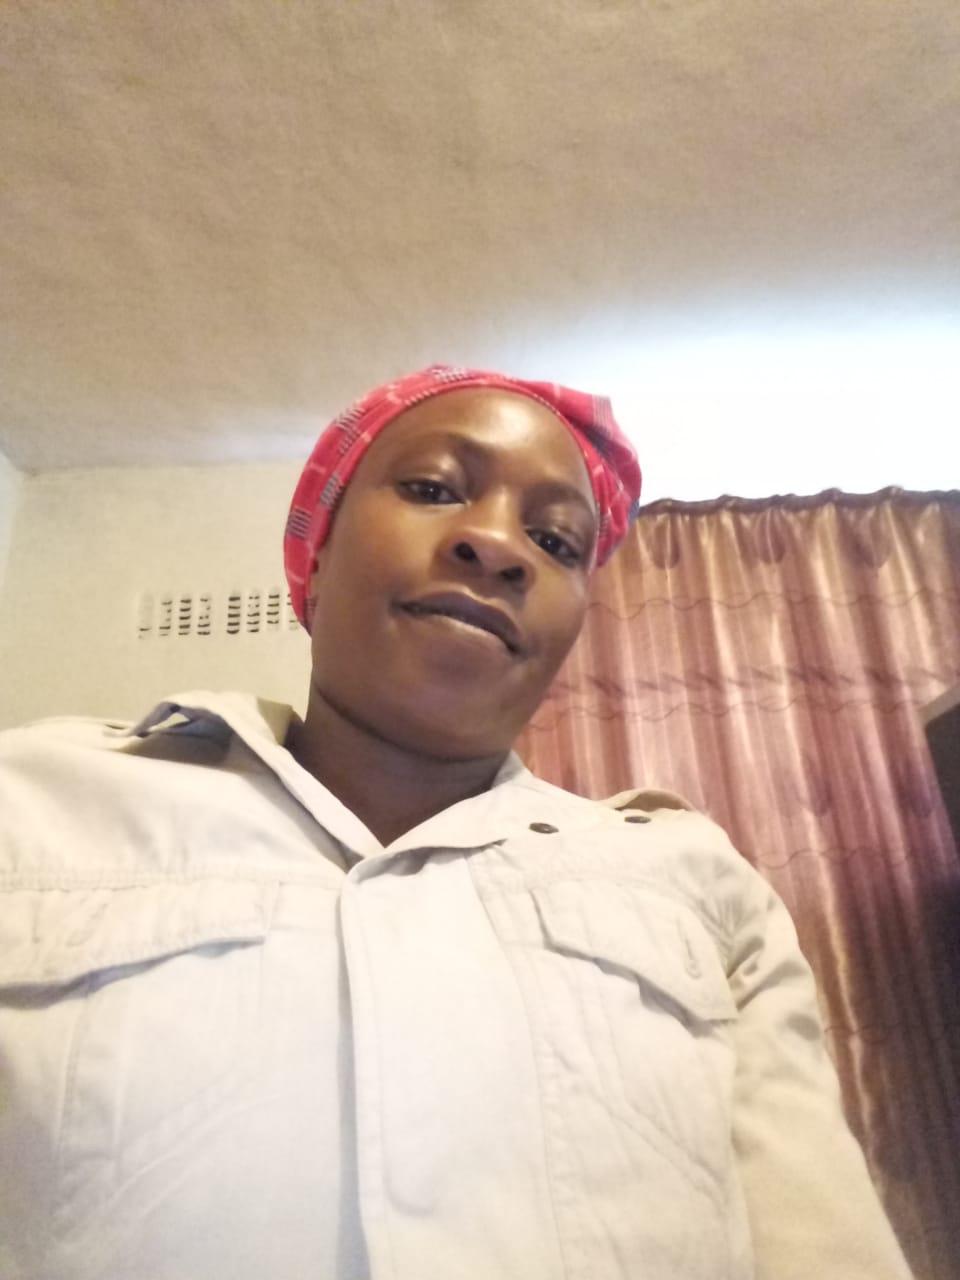 Zimbabwean prof.cook,chef,maid,cleaner,nanny needs work urgently